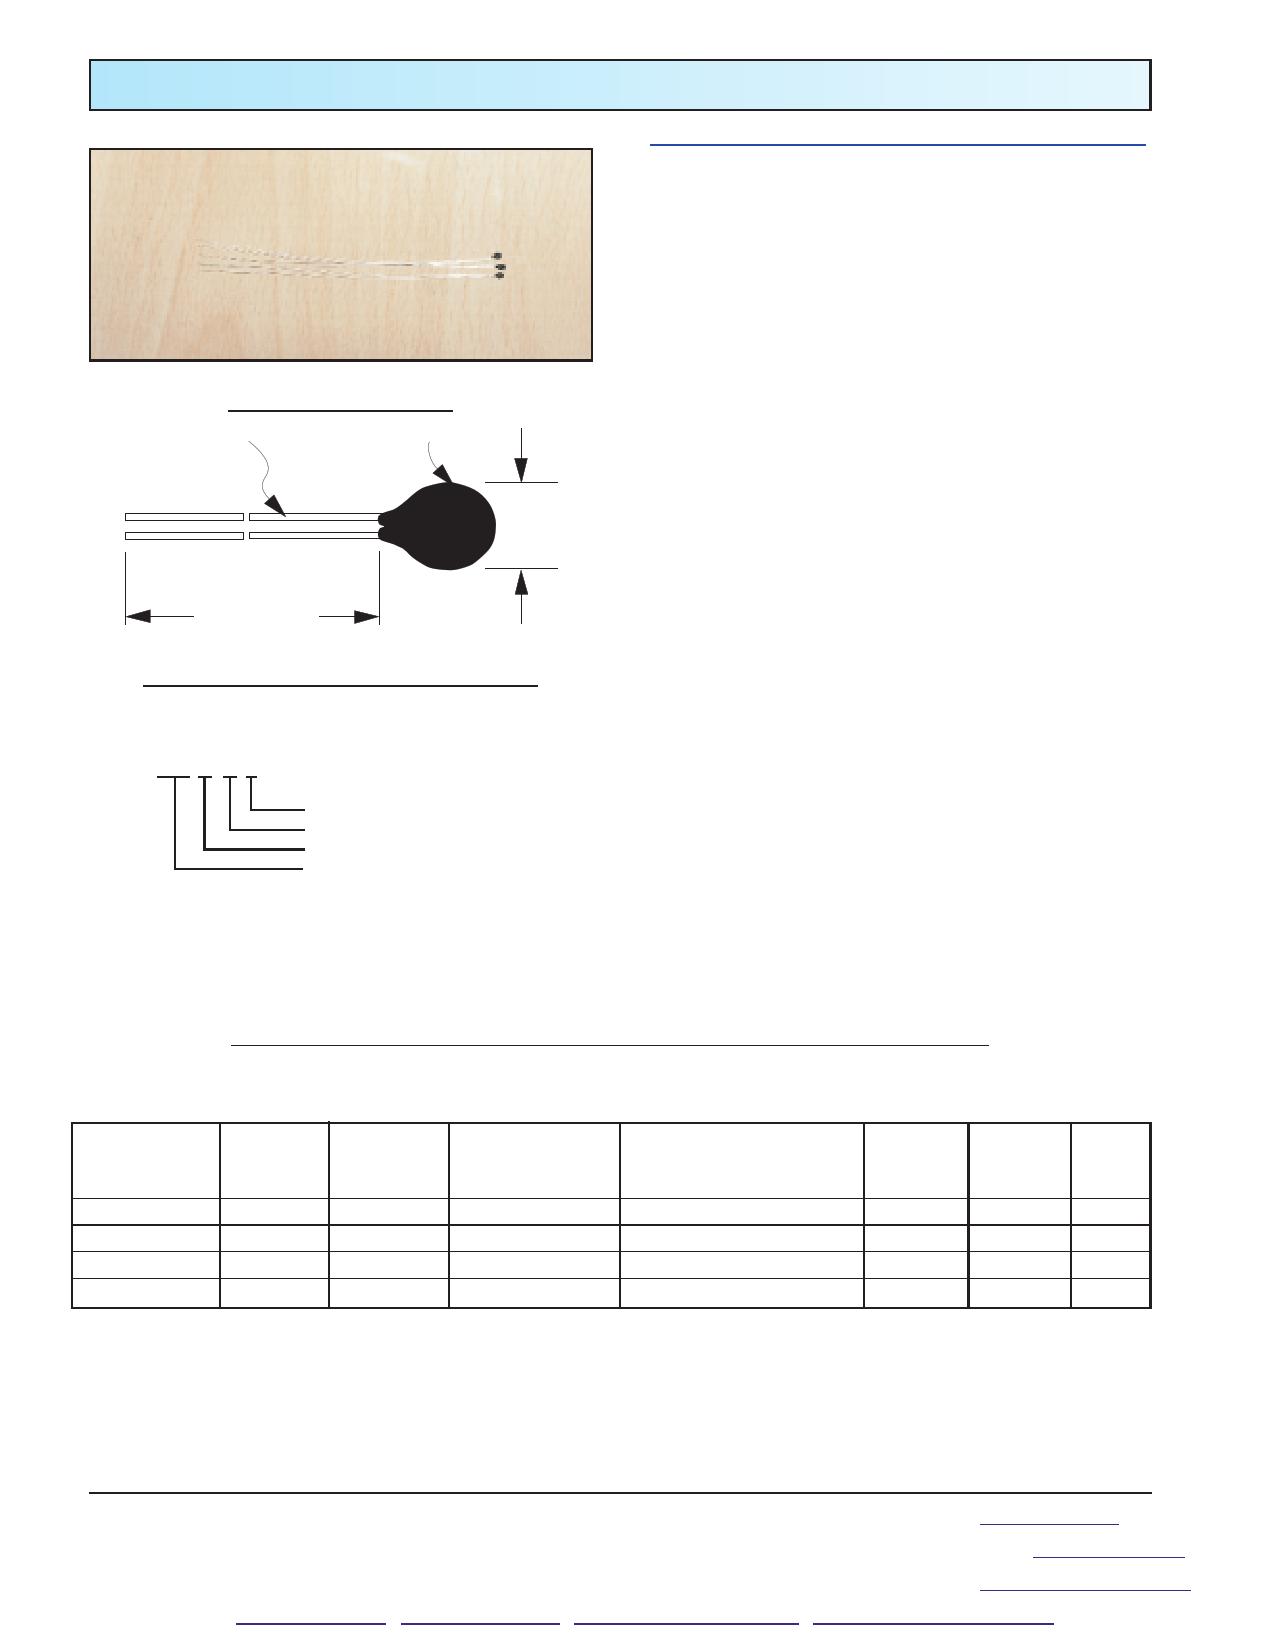 0.1K1A1 Hoja de datos, Descripción, Manual